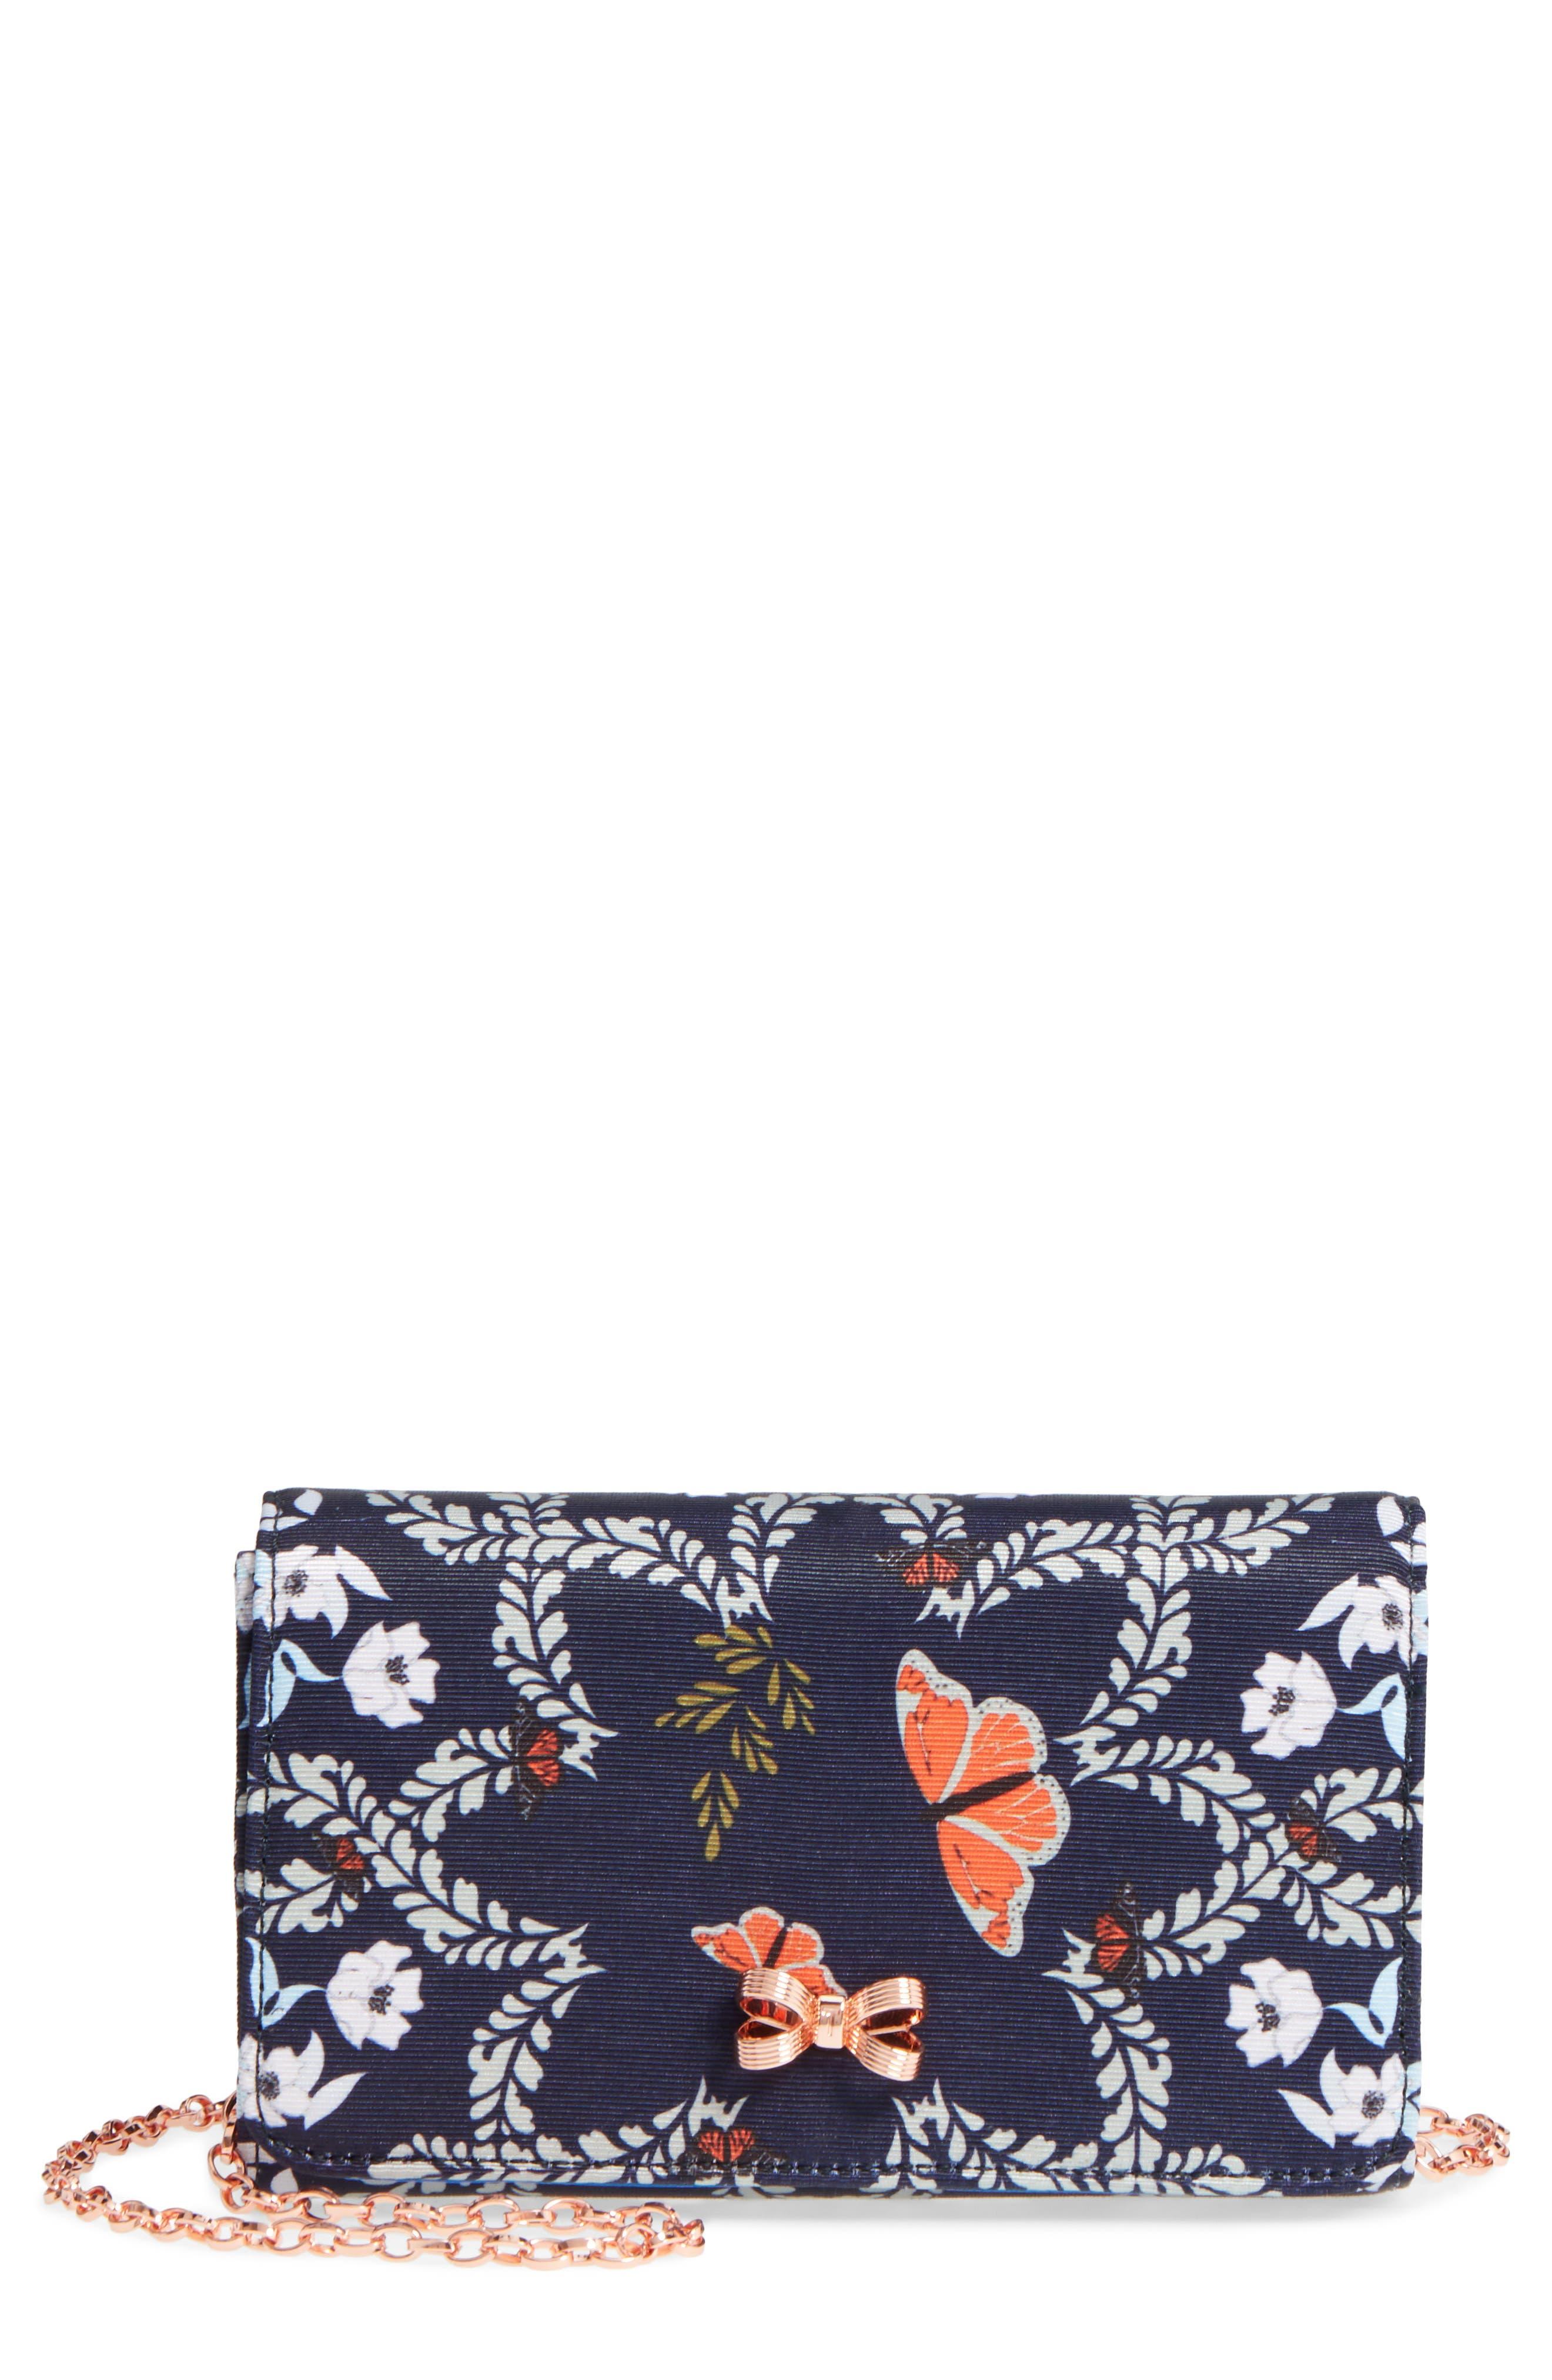 Kailyn - Kyoto Gardens Grosgrain Clutch,                             Main thumbnail 1, color,